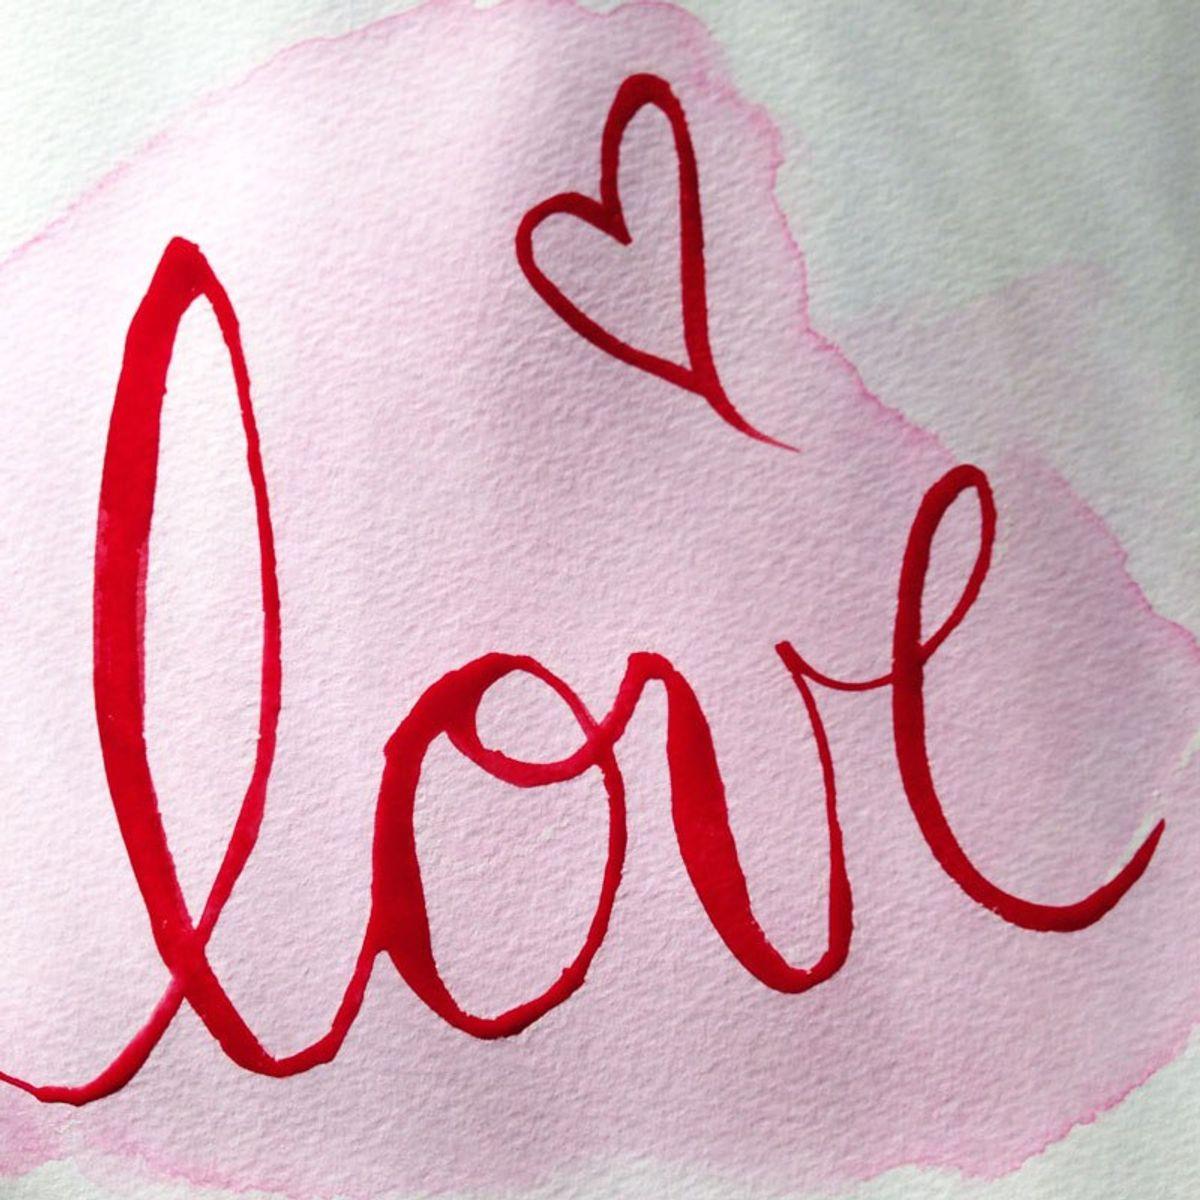 Celebrating Valentine's Month